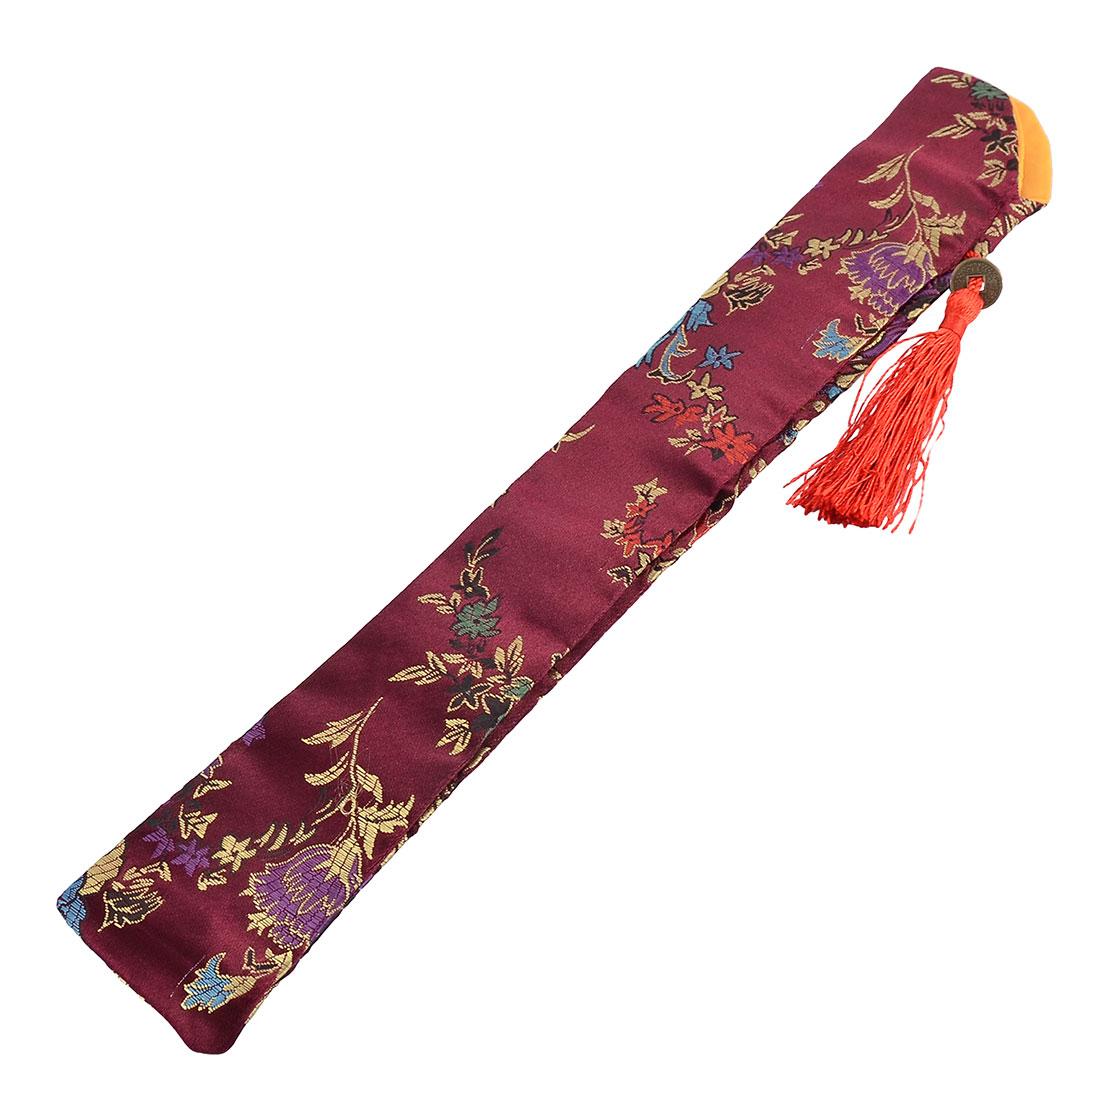 Soft Fabric Retro Style Tassel Flower Pattern Hand Held Folding Fan Pouch Eggplant Color